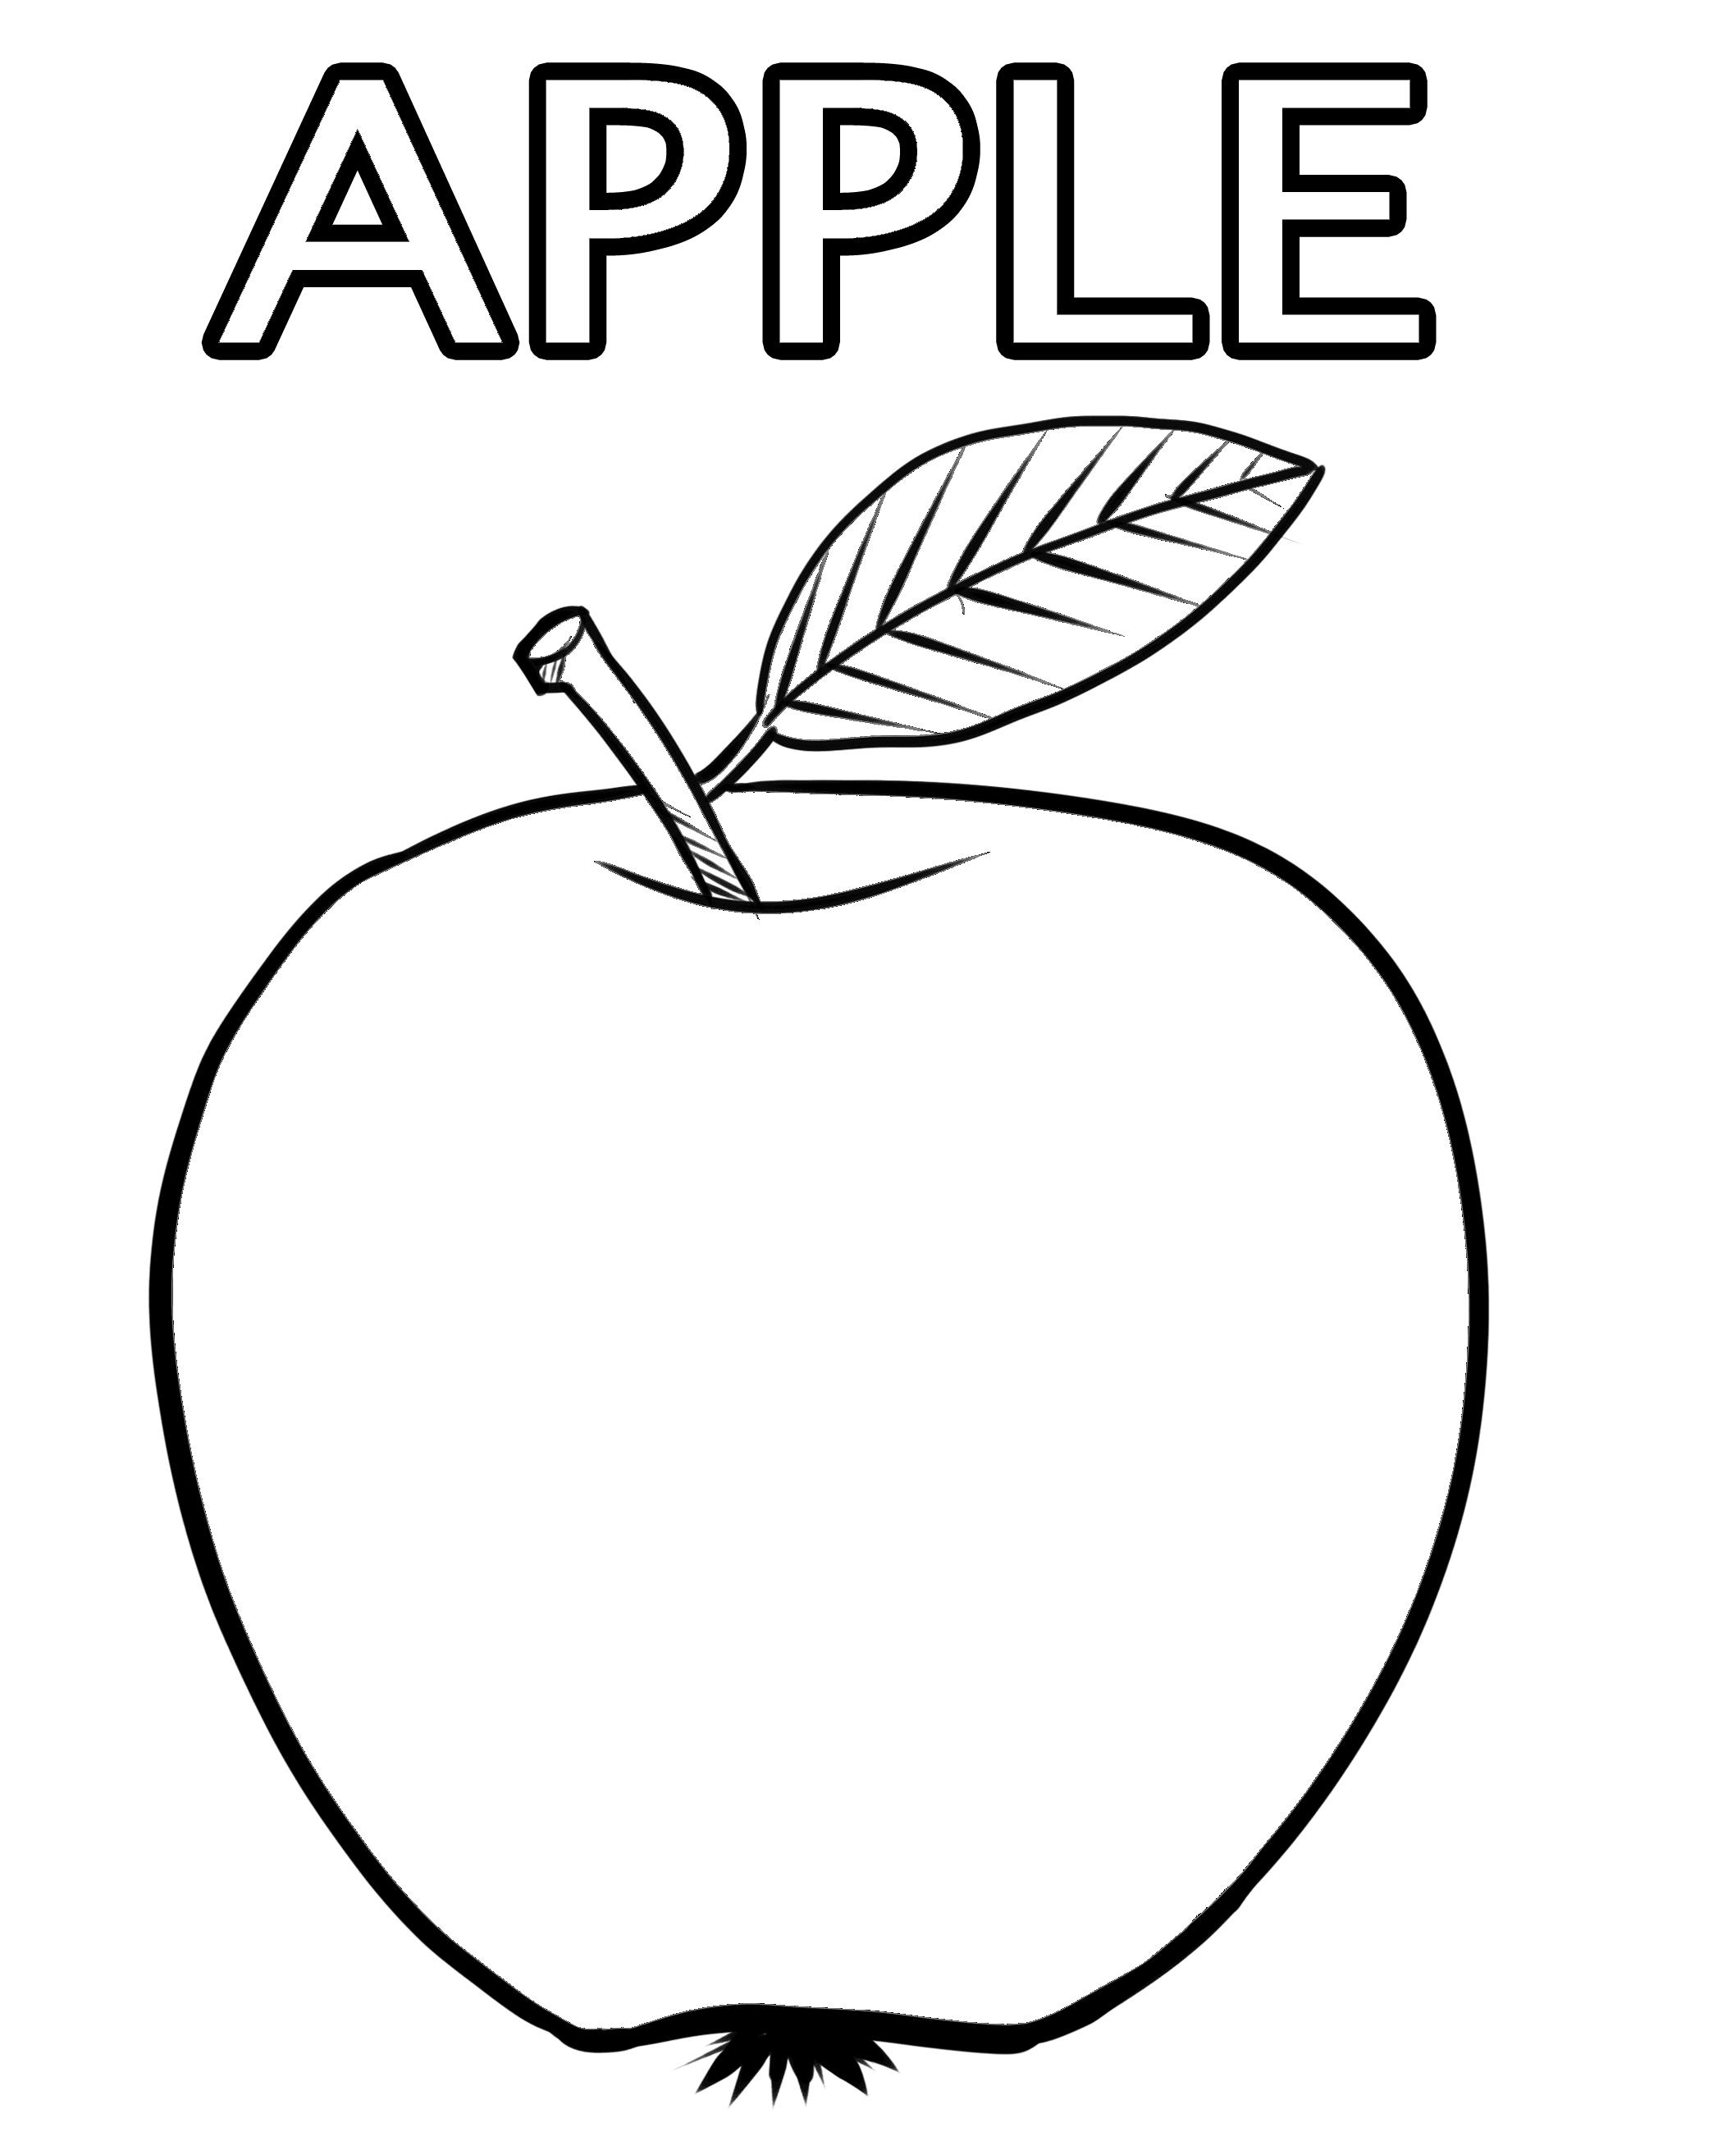 A For Apple Alphabet Coloring Pages Alphabet Coloring Coloring Pages Alphabet Coloring Pages